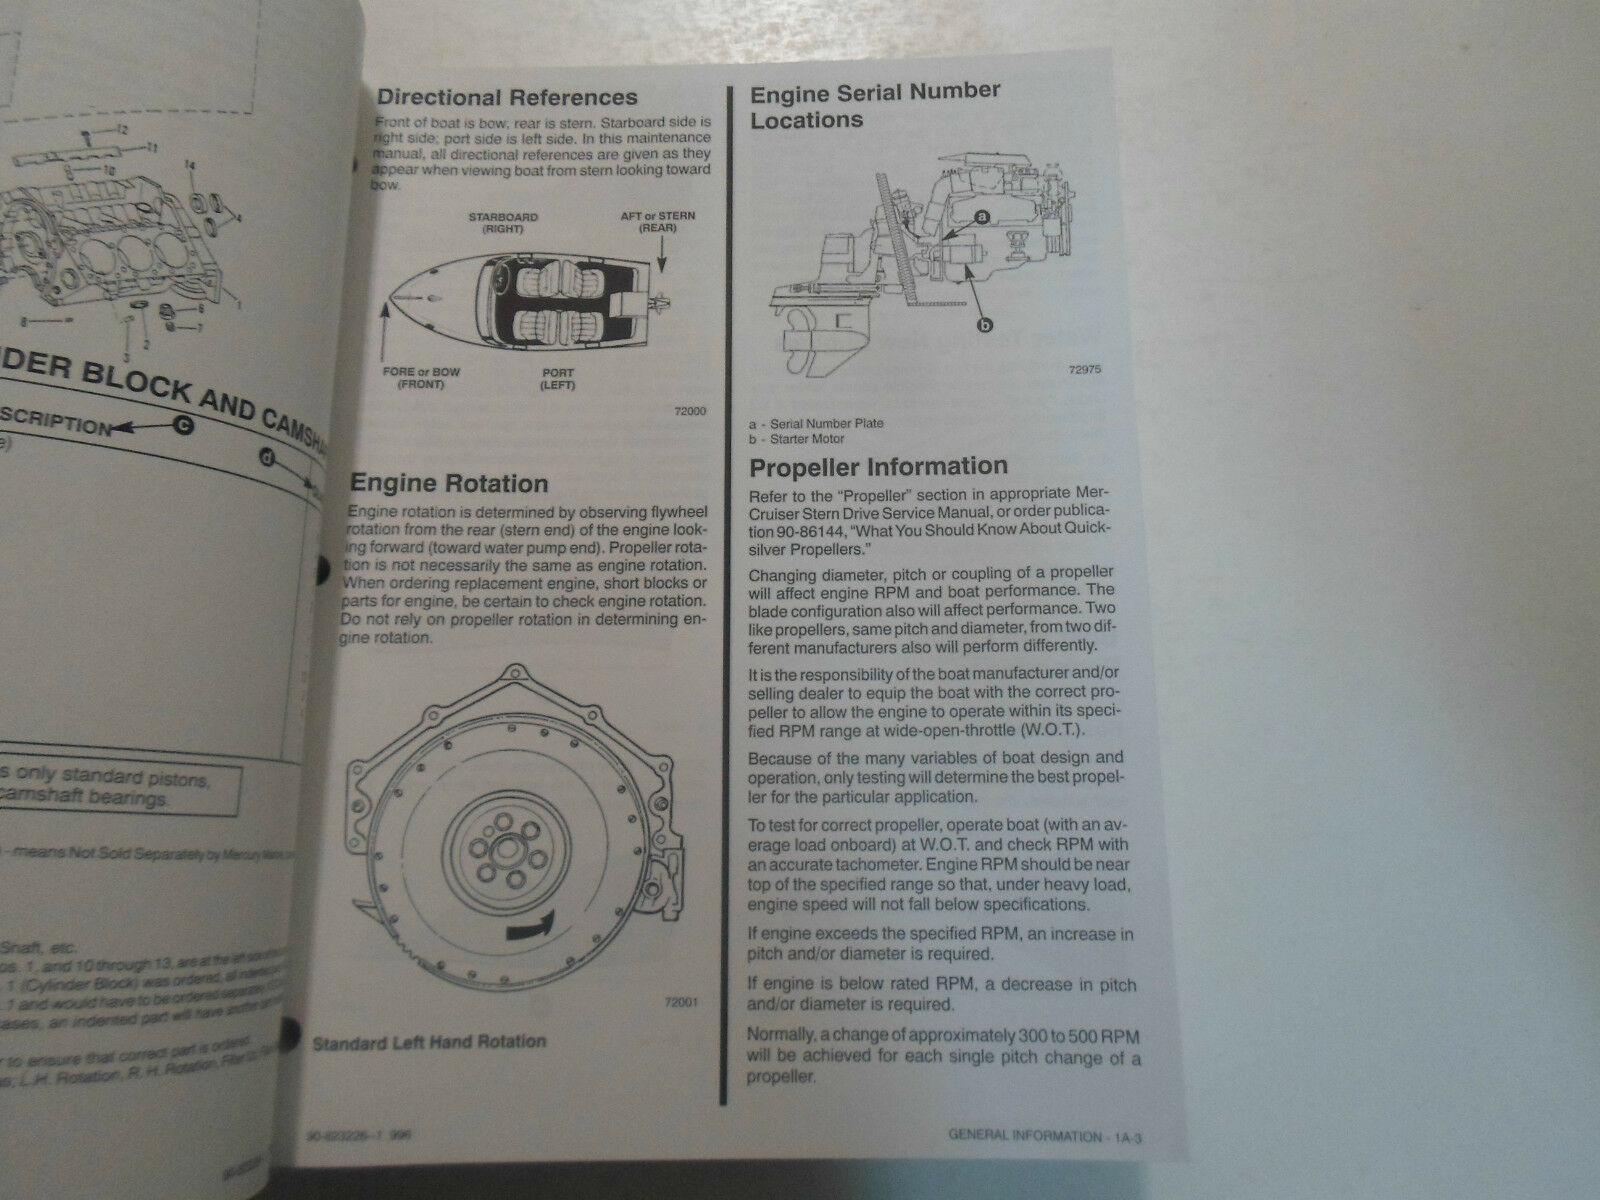 1996 Mercruiser #18 Marine Engines GM V6 262 Cid Balance Schaft Service Manuell image 7